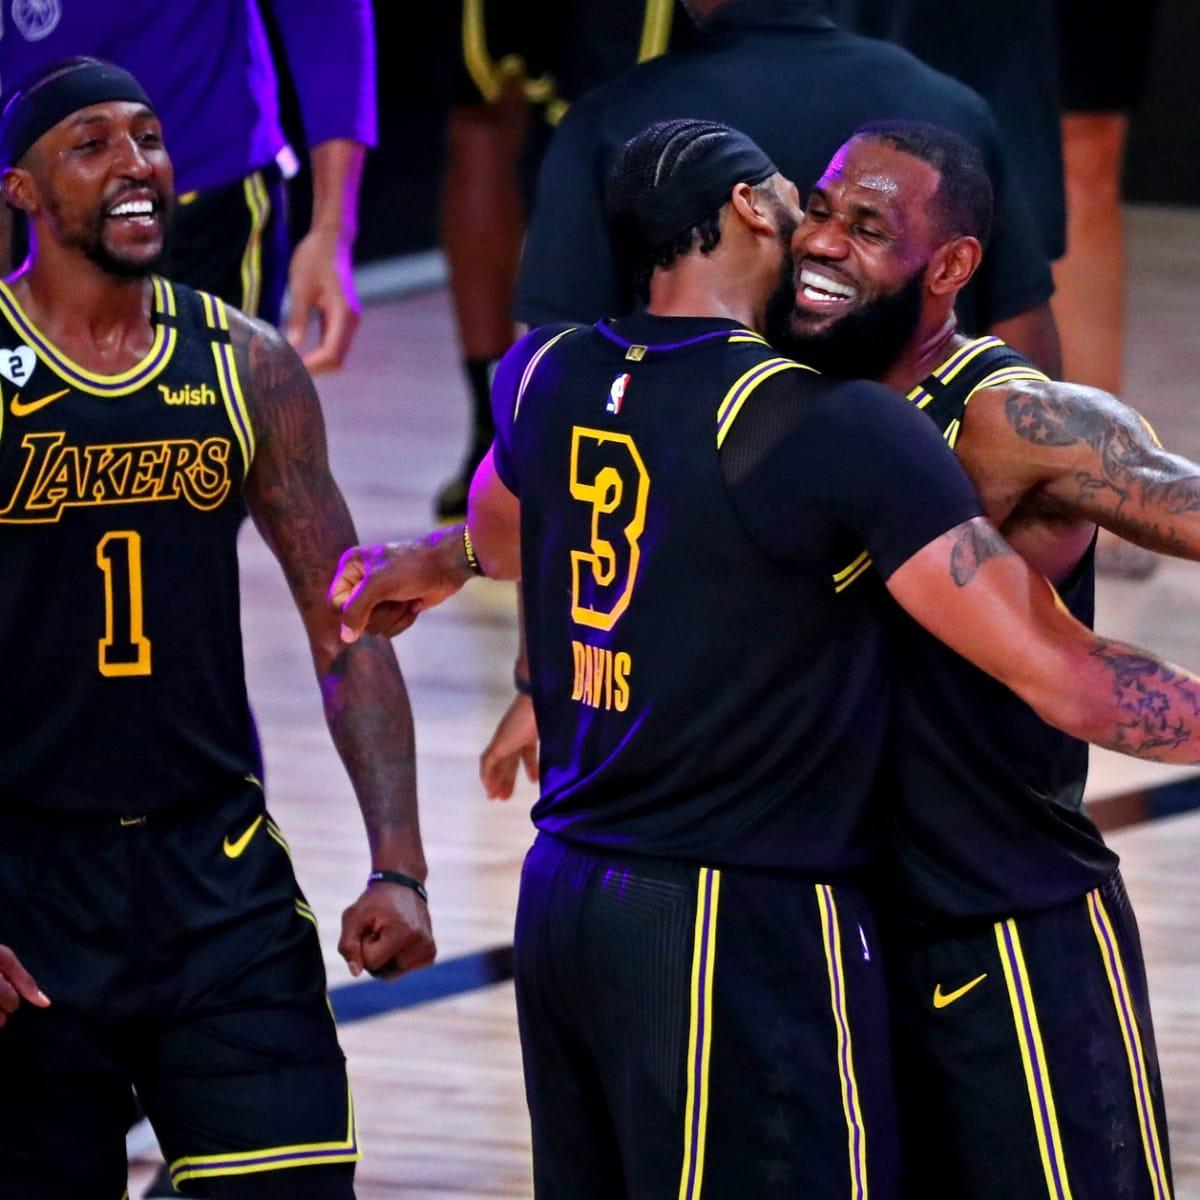 Anthony Davis Yells 'Kobe' After Making Greatest Shot Of His ...